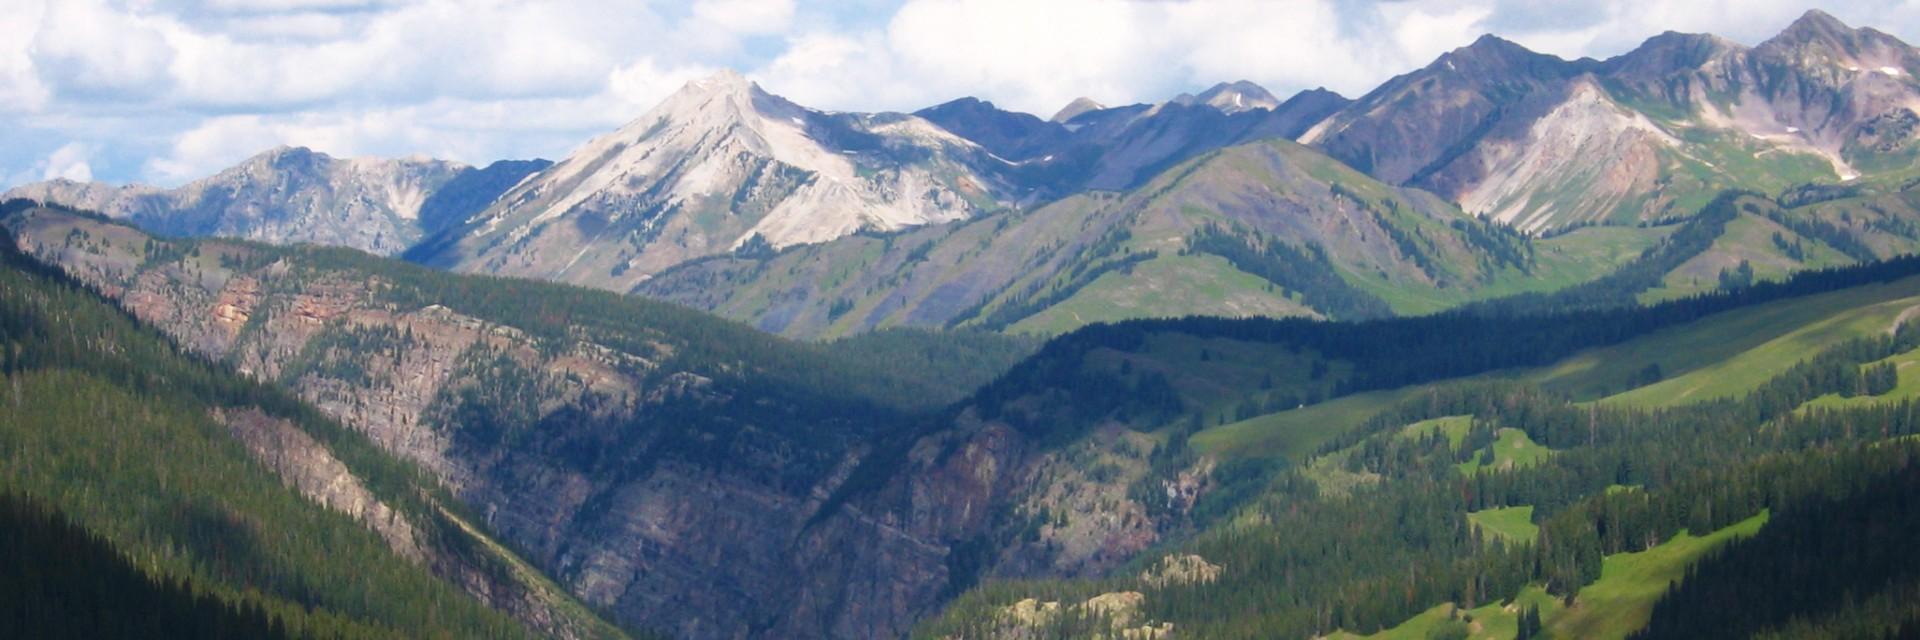 View from high in the San Juan Range, Colorado Trail, advanced mountain bike tour